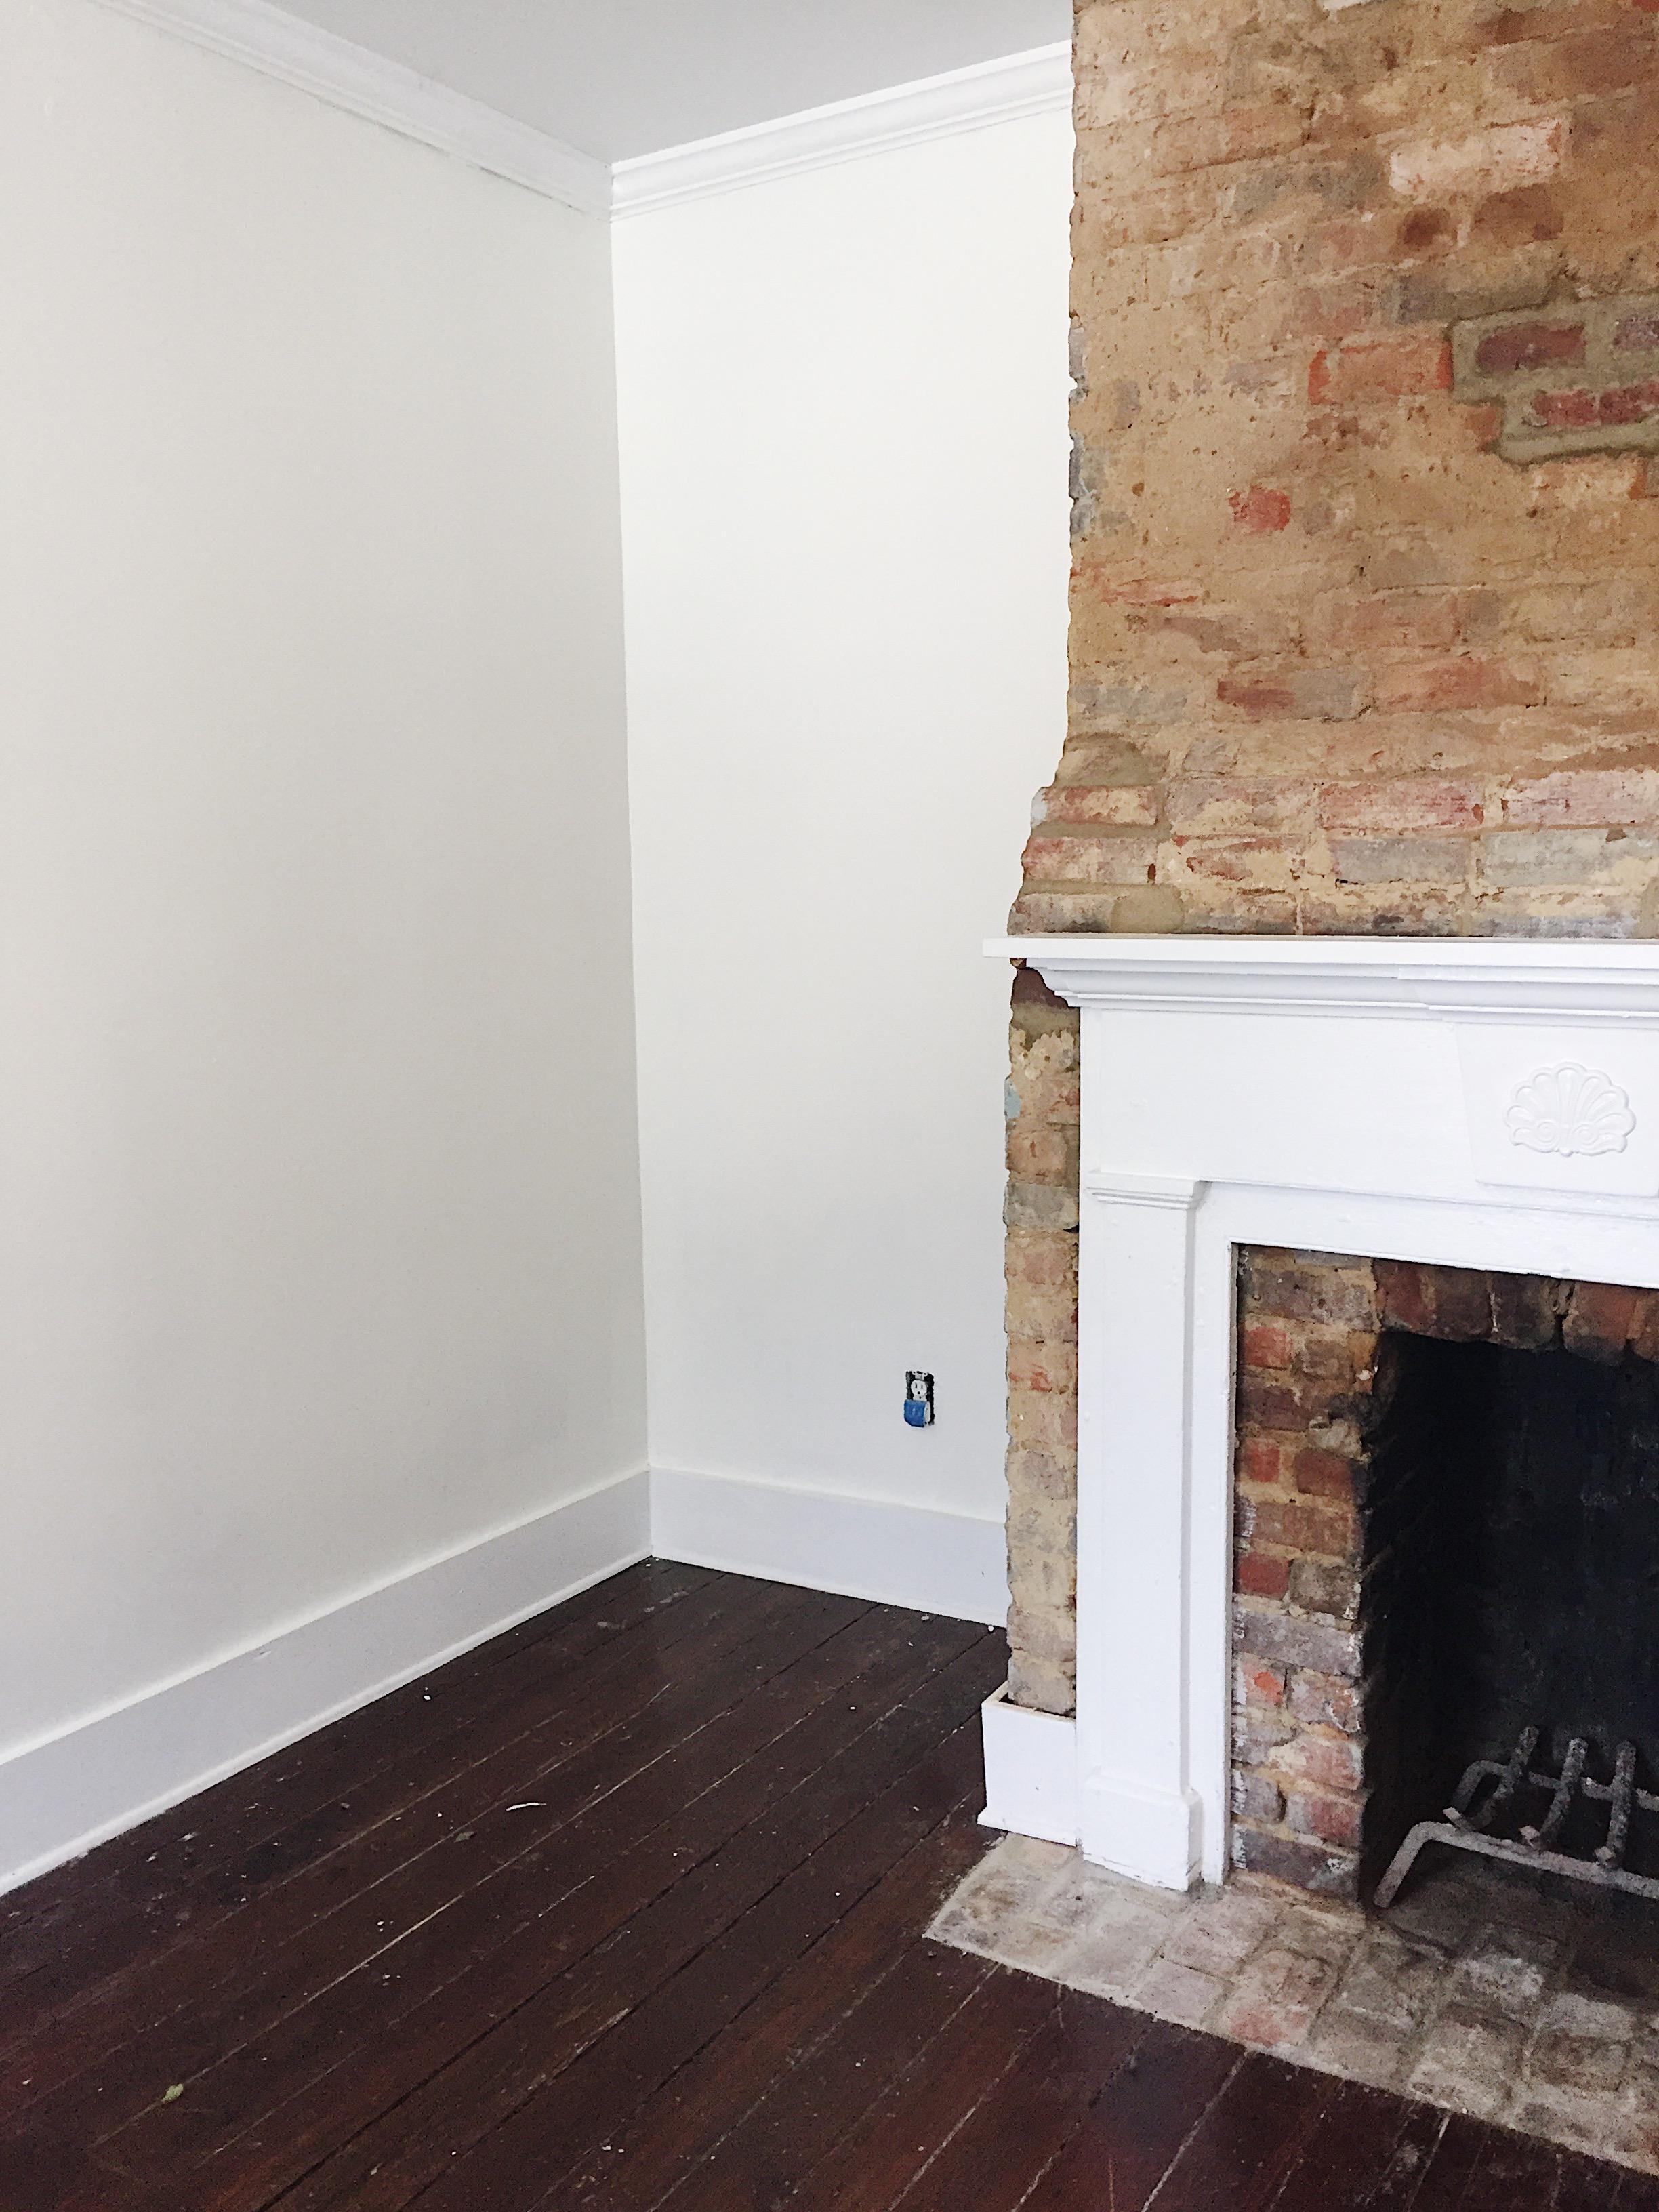 Charleston_south_carolina_exposed_fireplace_historic_home_bedroom_renovation_fireplace_mantle_1.JPG